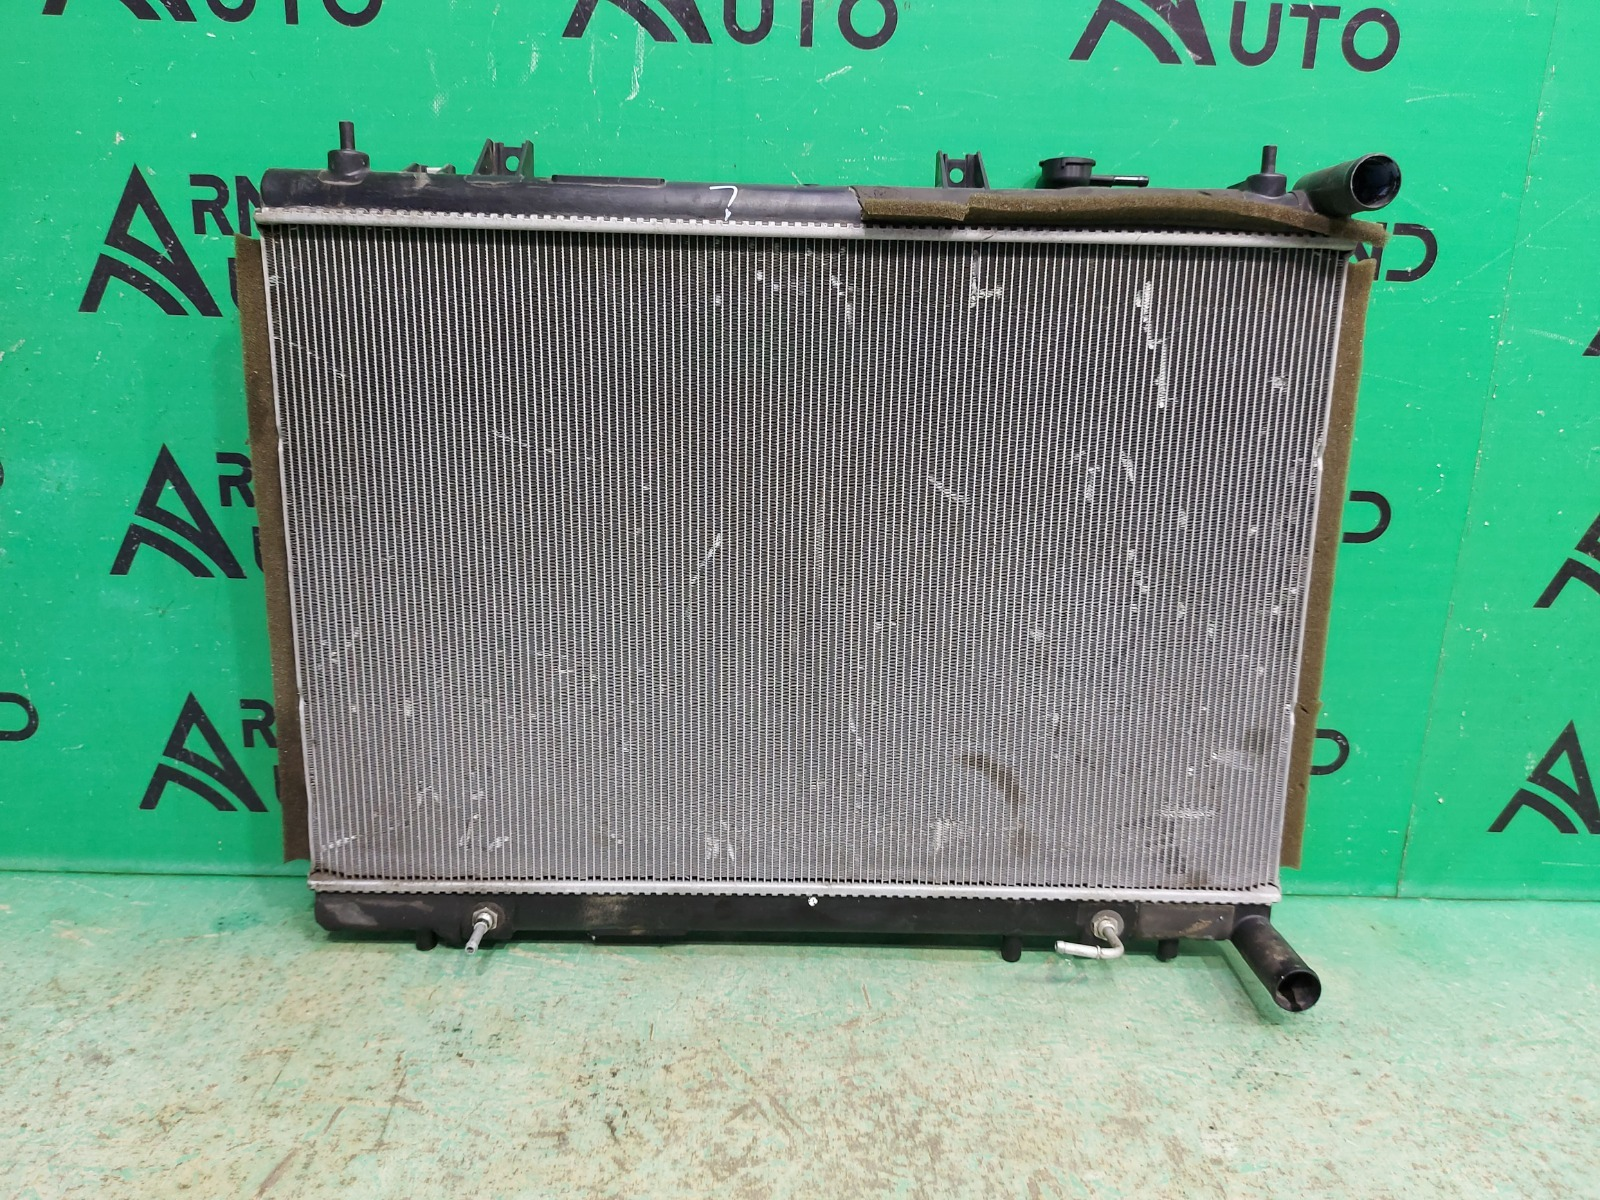 Радиатор охлаждения Infiniti Jx Qx60 L50 2012 (б/у)